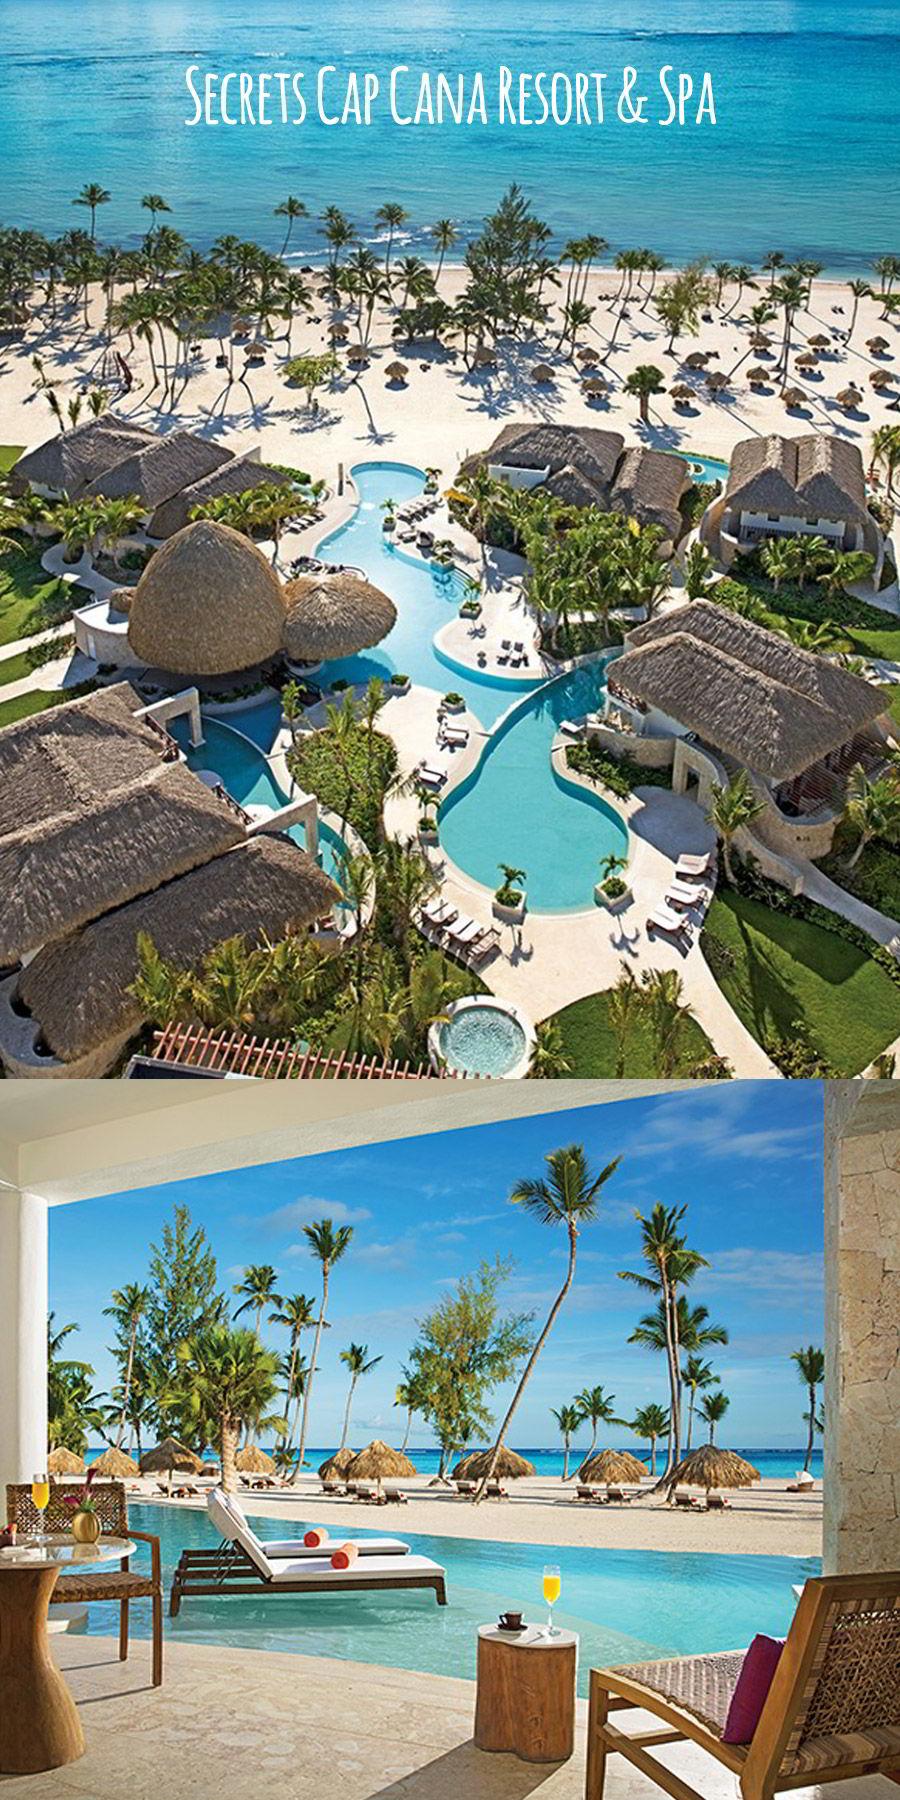 secrets resorts cap cana resort spa dominican republic destination wedding venue luxury honeymoon aerial view bungalow pool